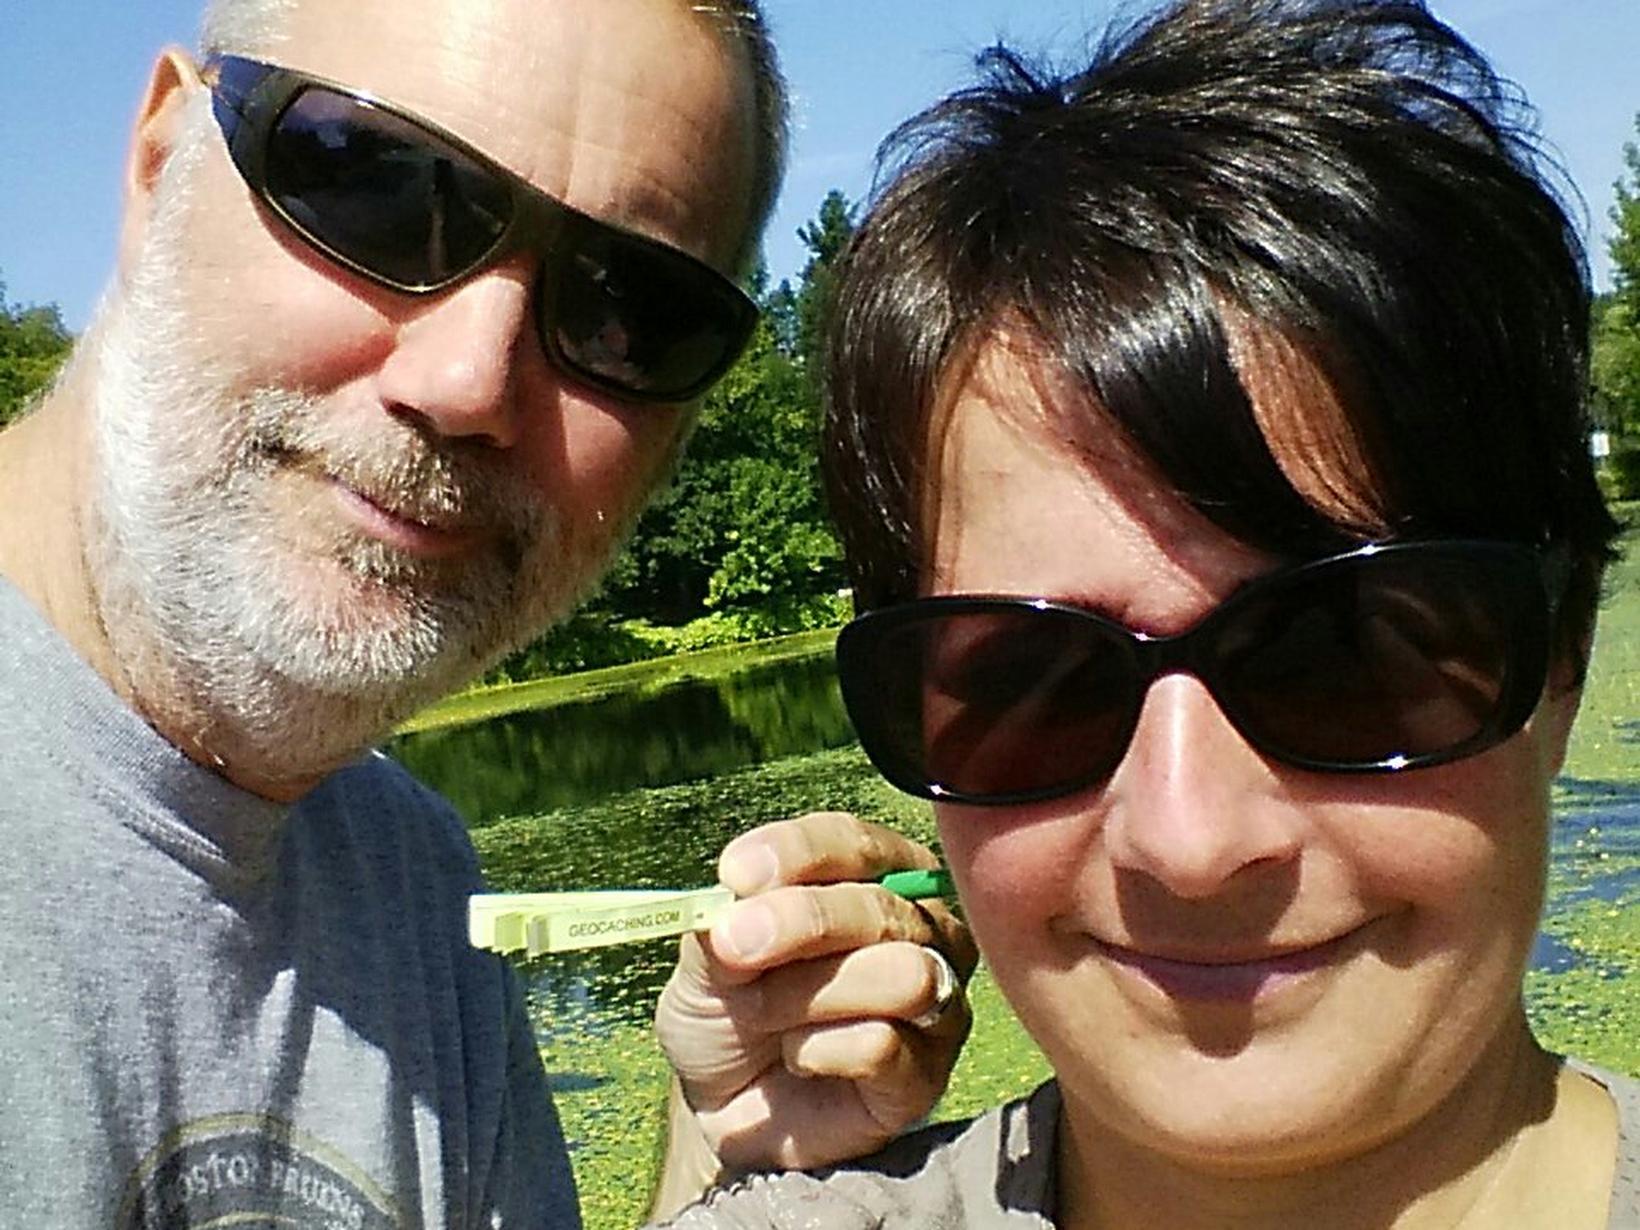 James & Valerie from Montréal, Quebec, Canada